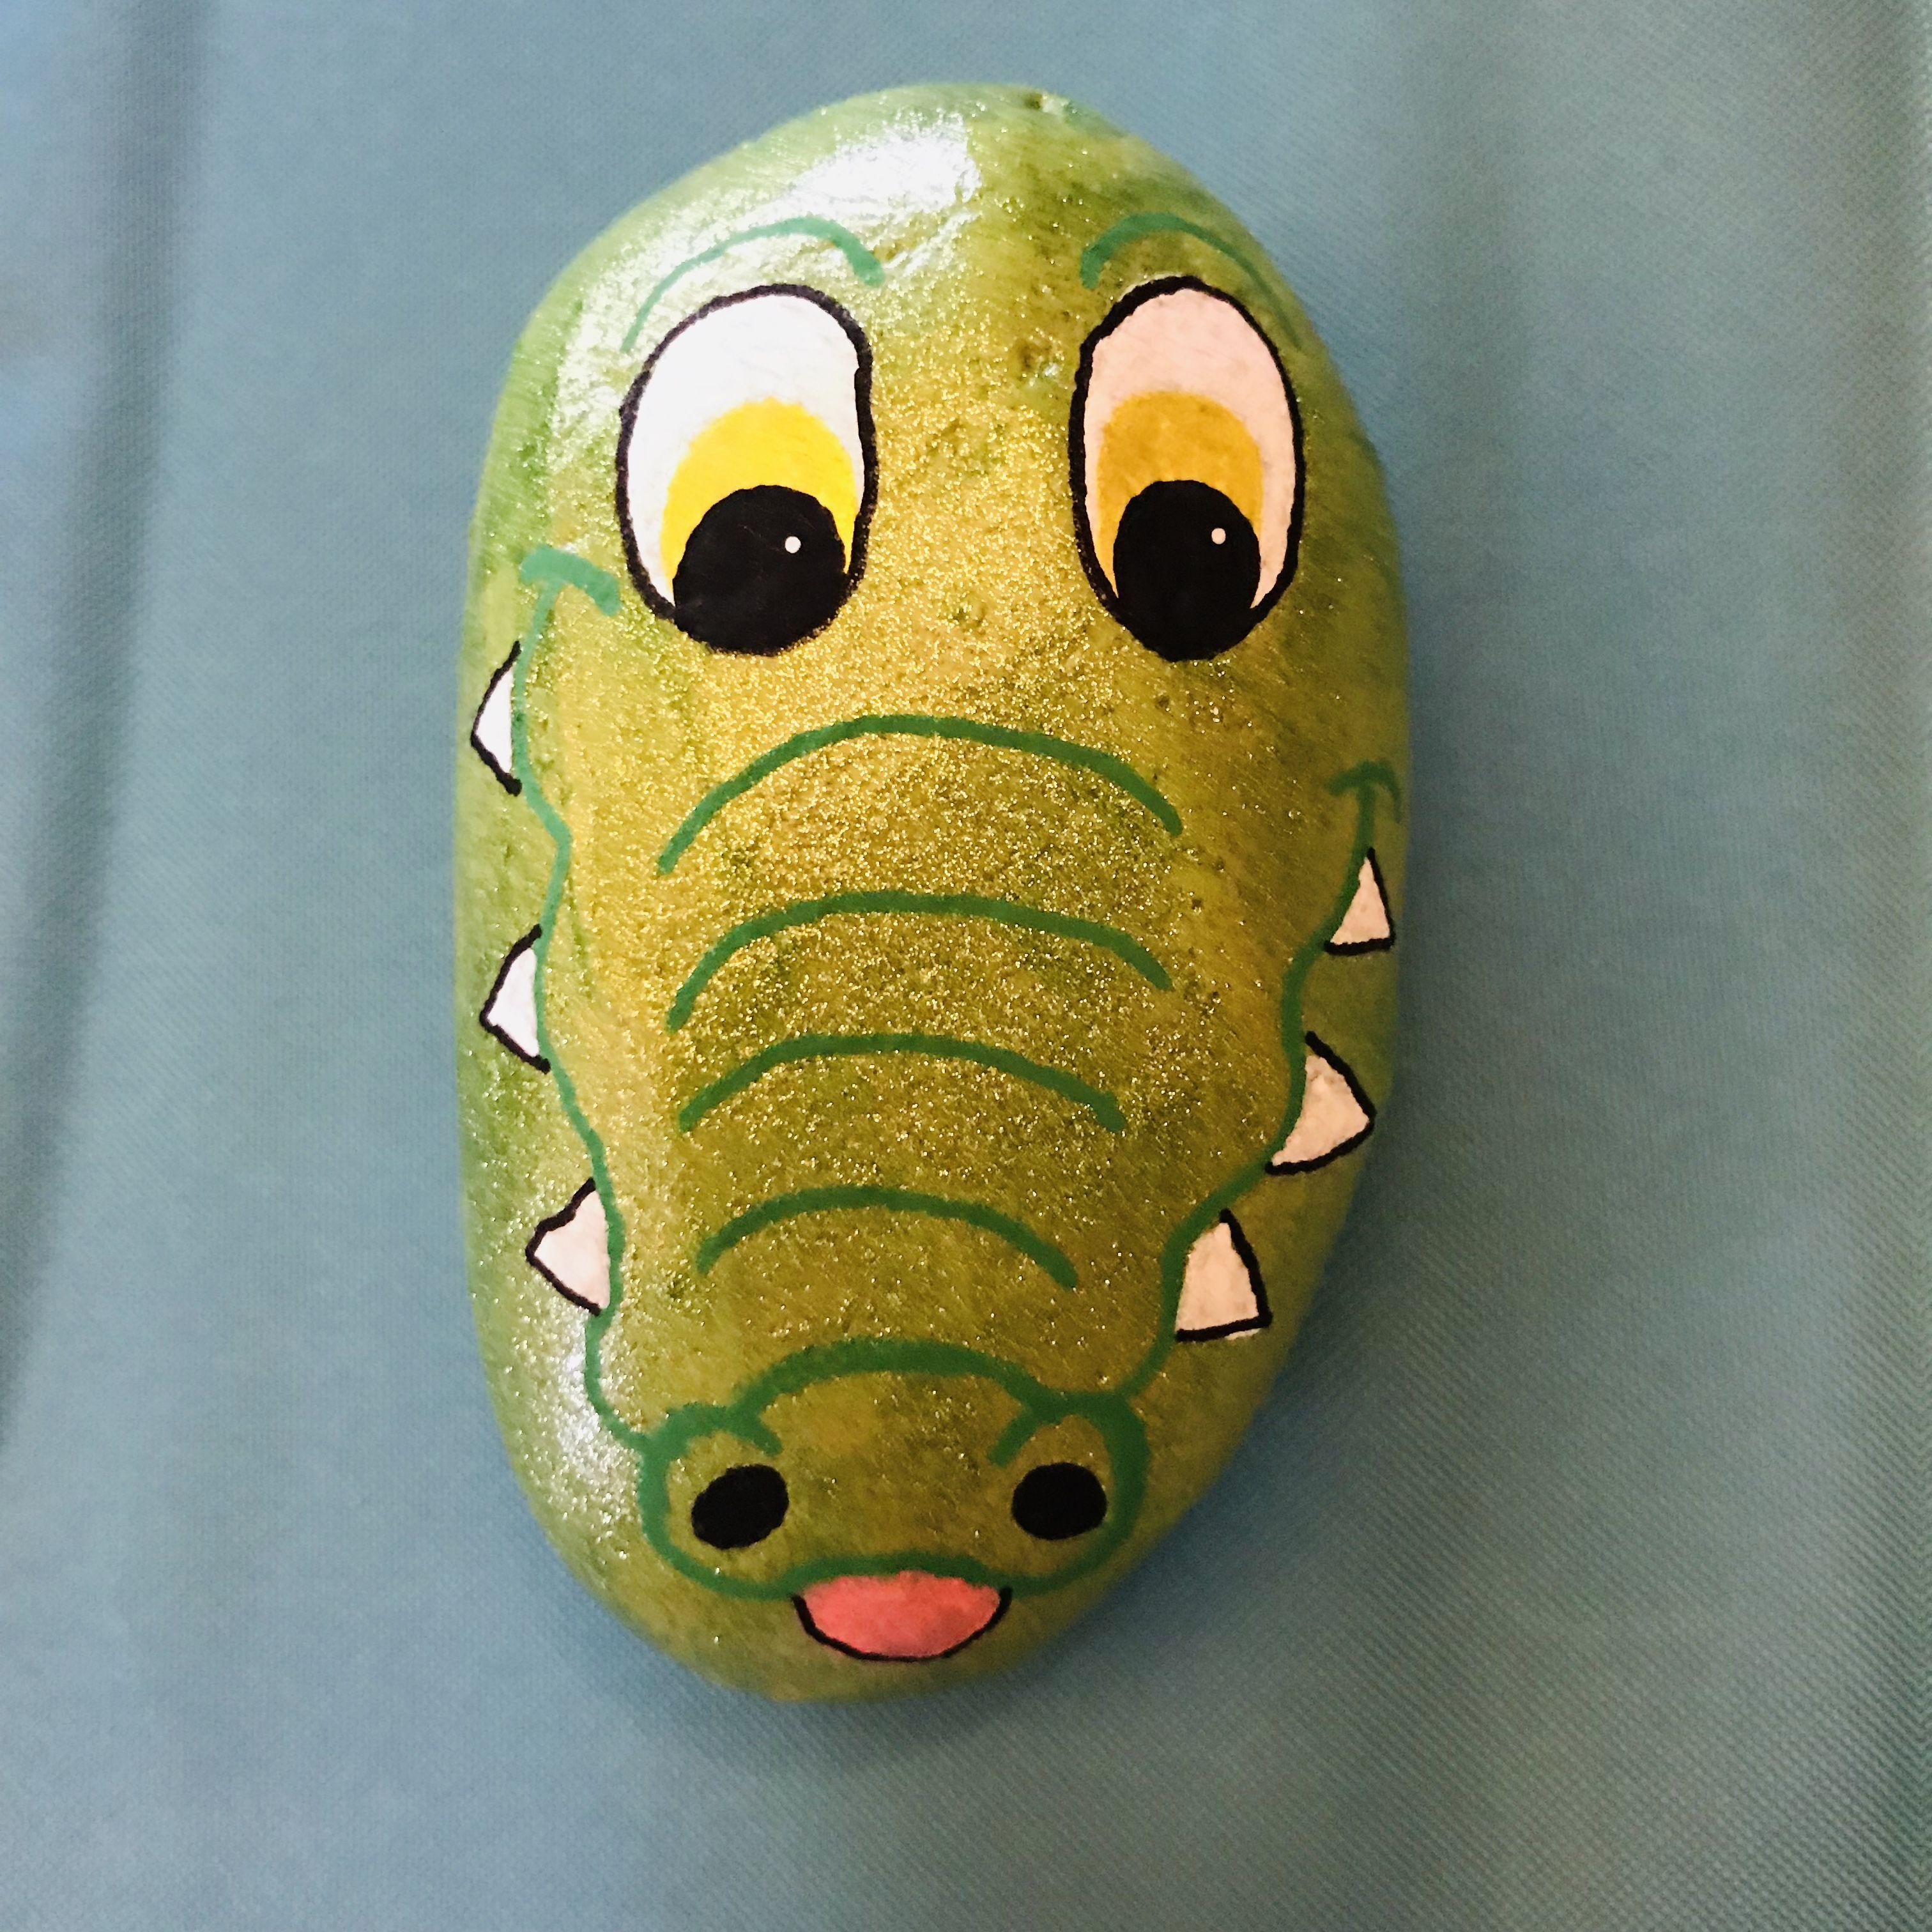 Alligator painted rock